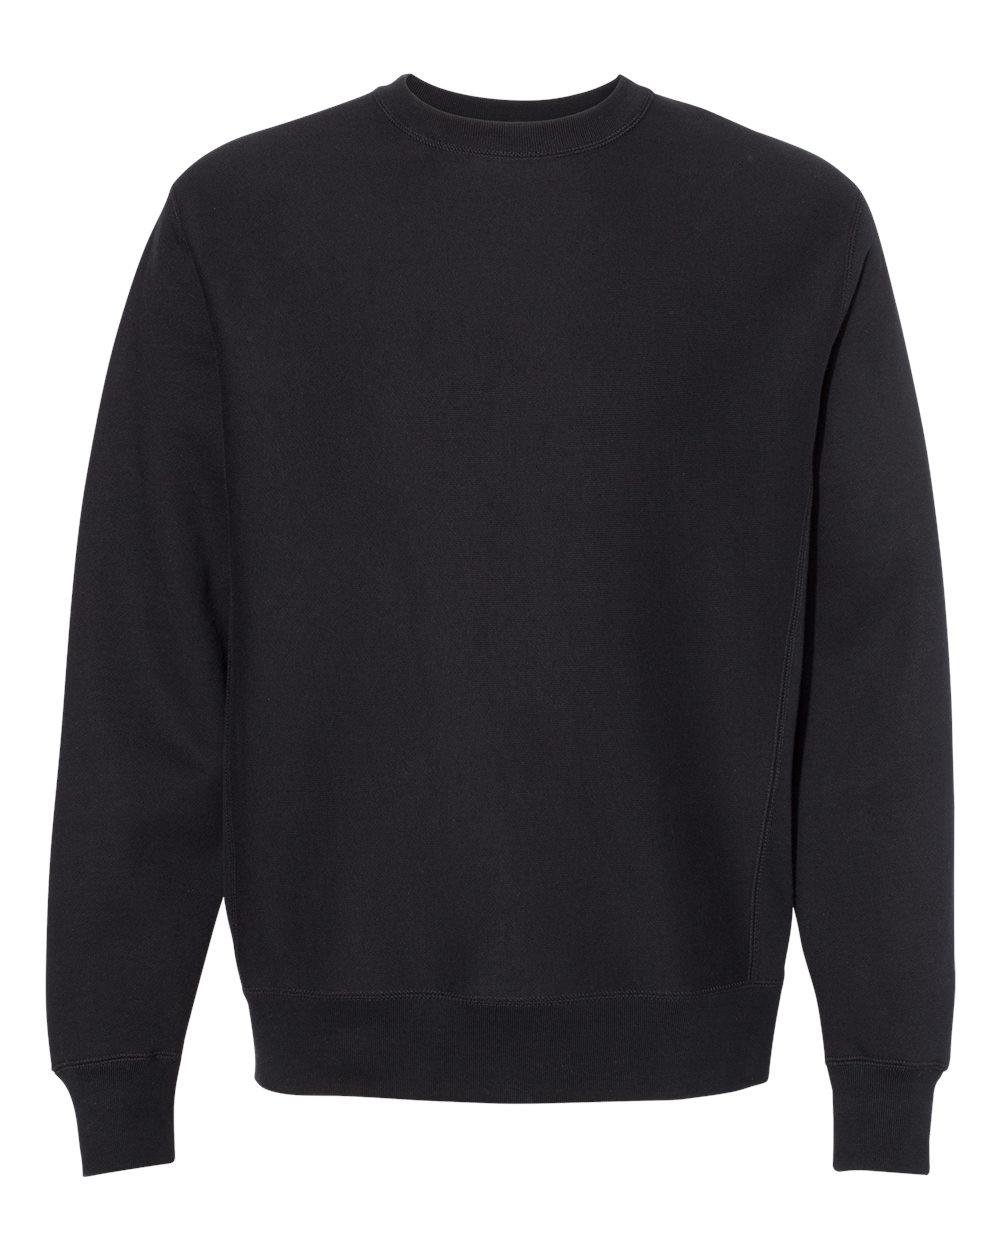 Picture of Independent Trading Co. Premium Heavyweight Cross-Gain Crewneck Sweatshirt